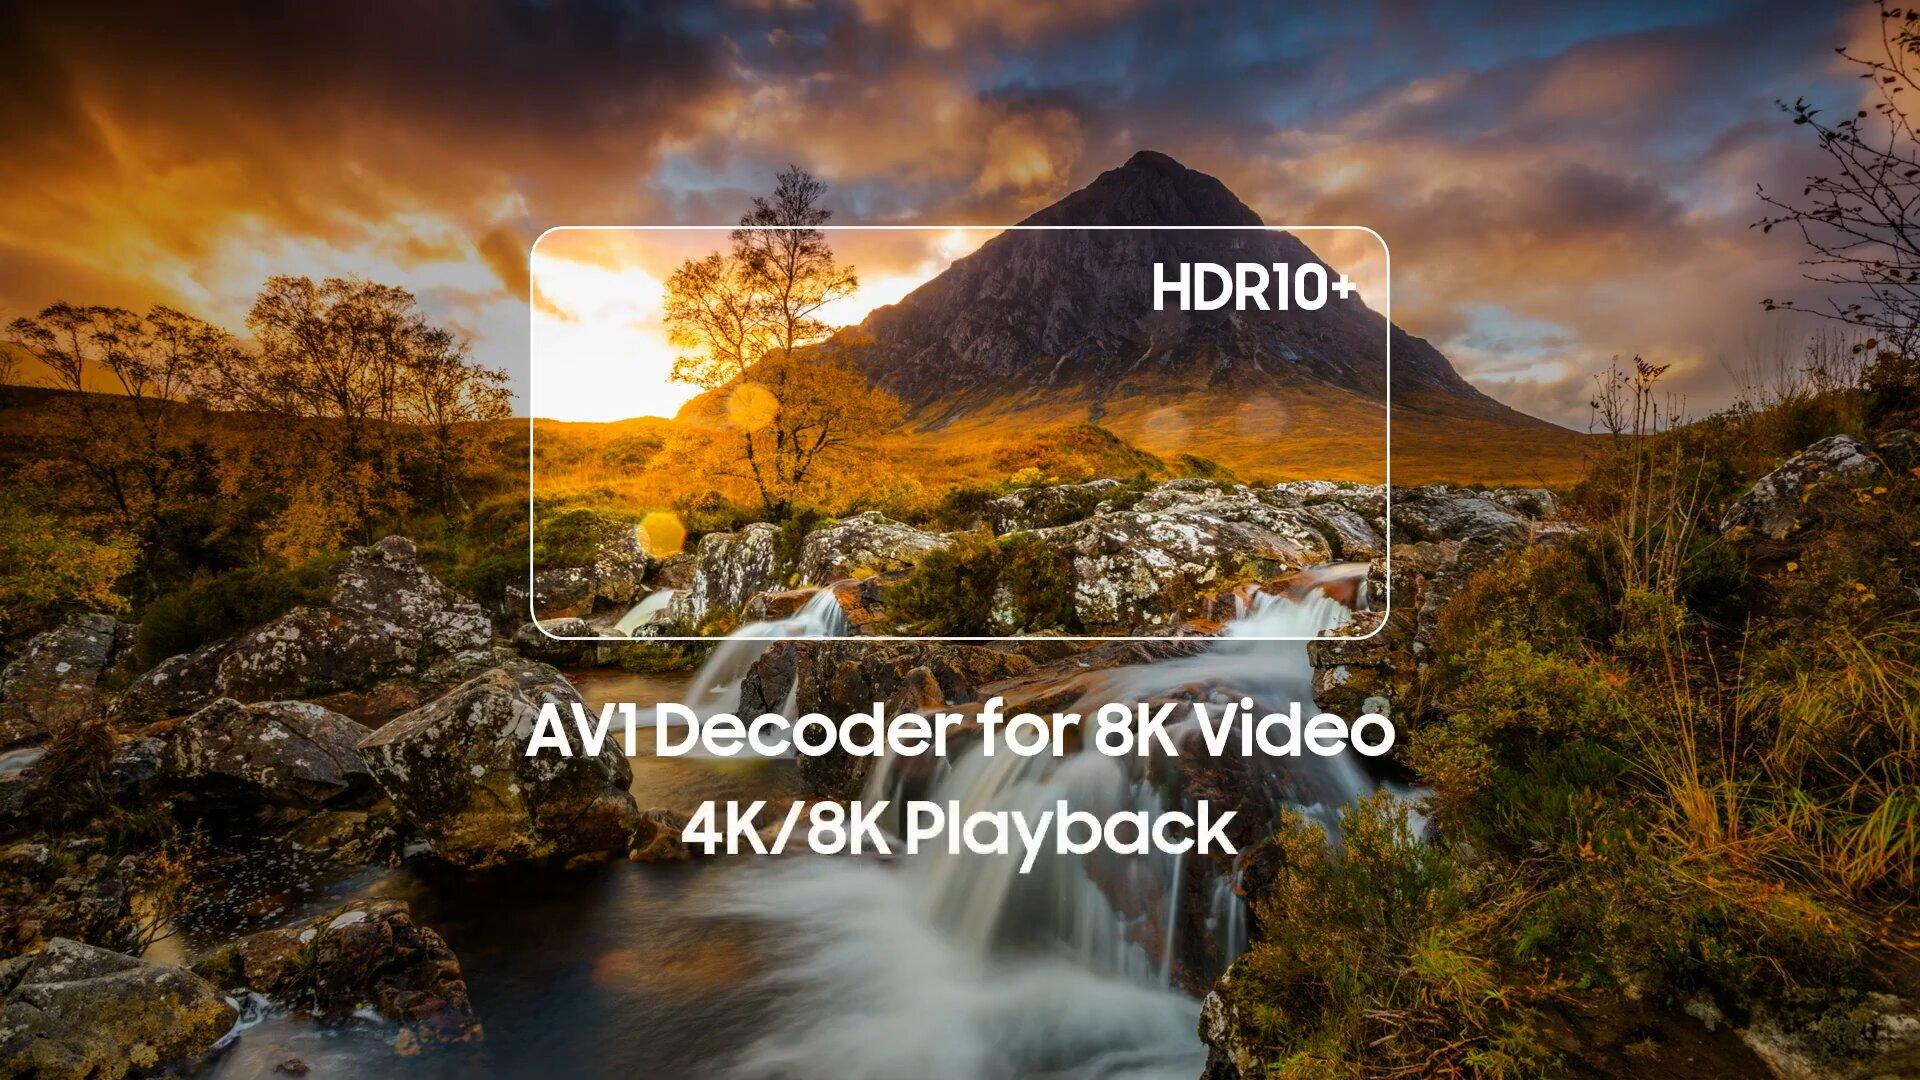 Erstmals integrierter AV1-Decoder